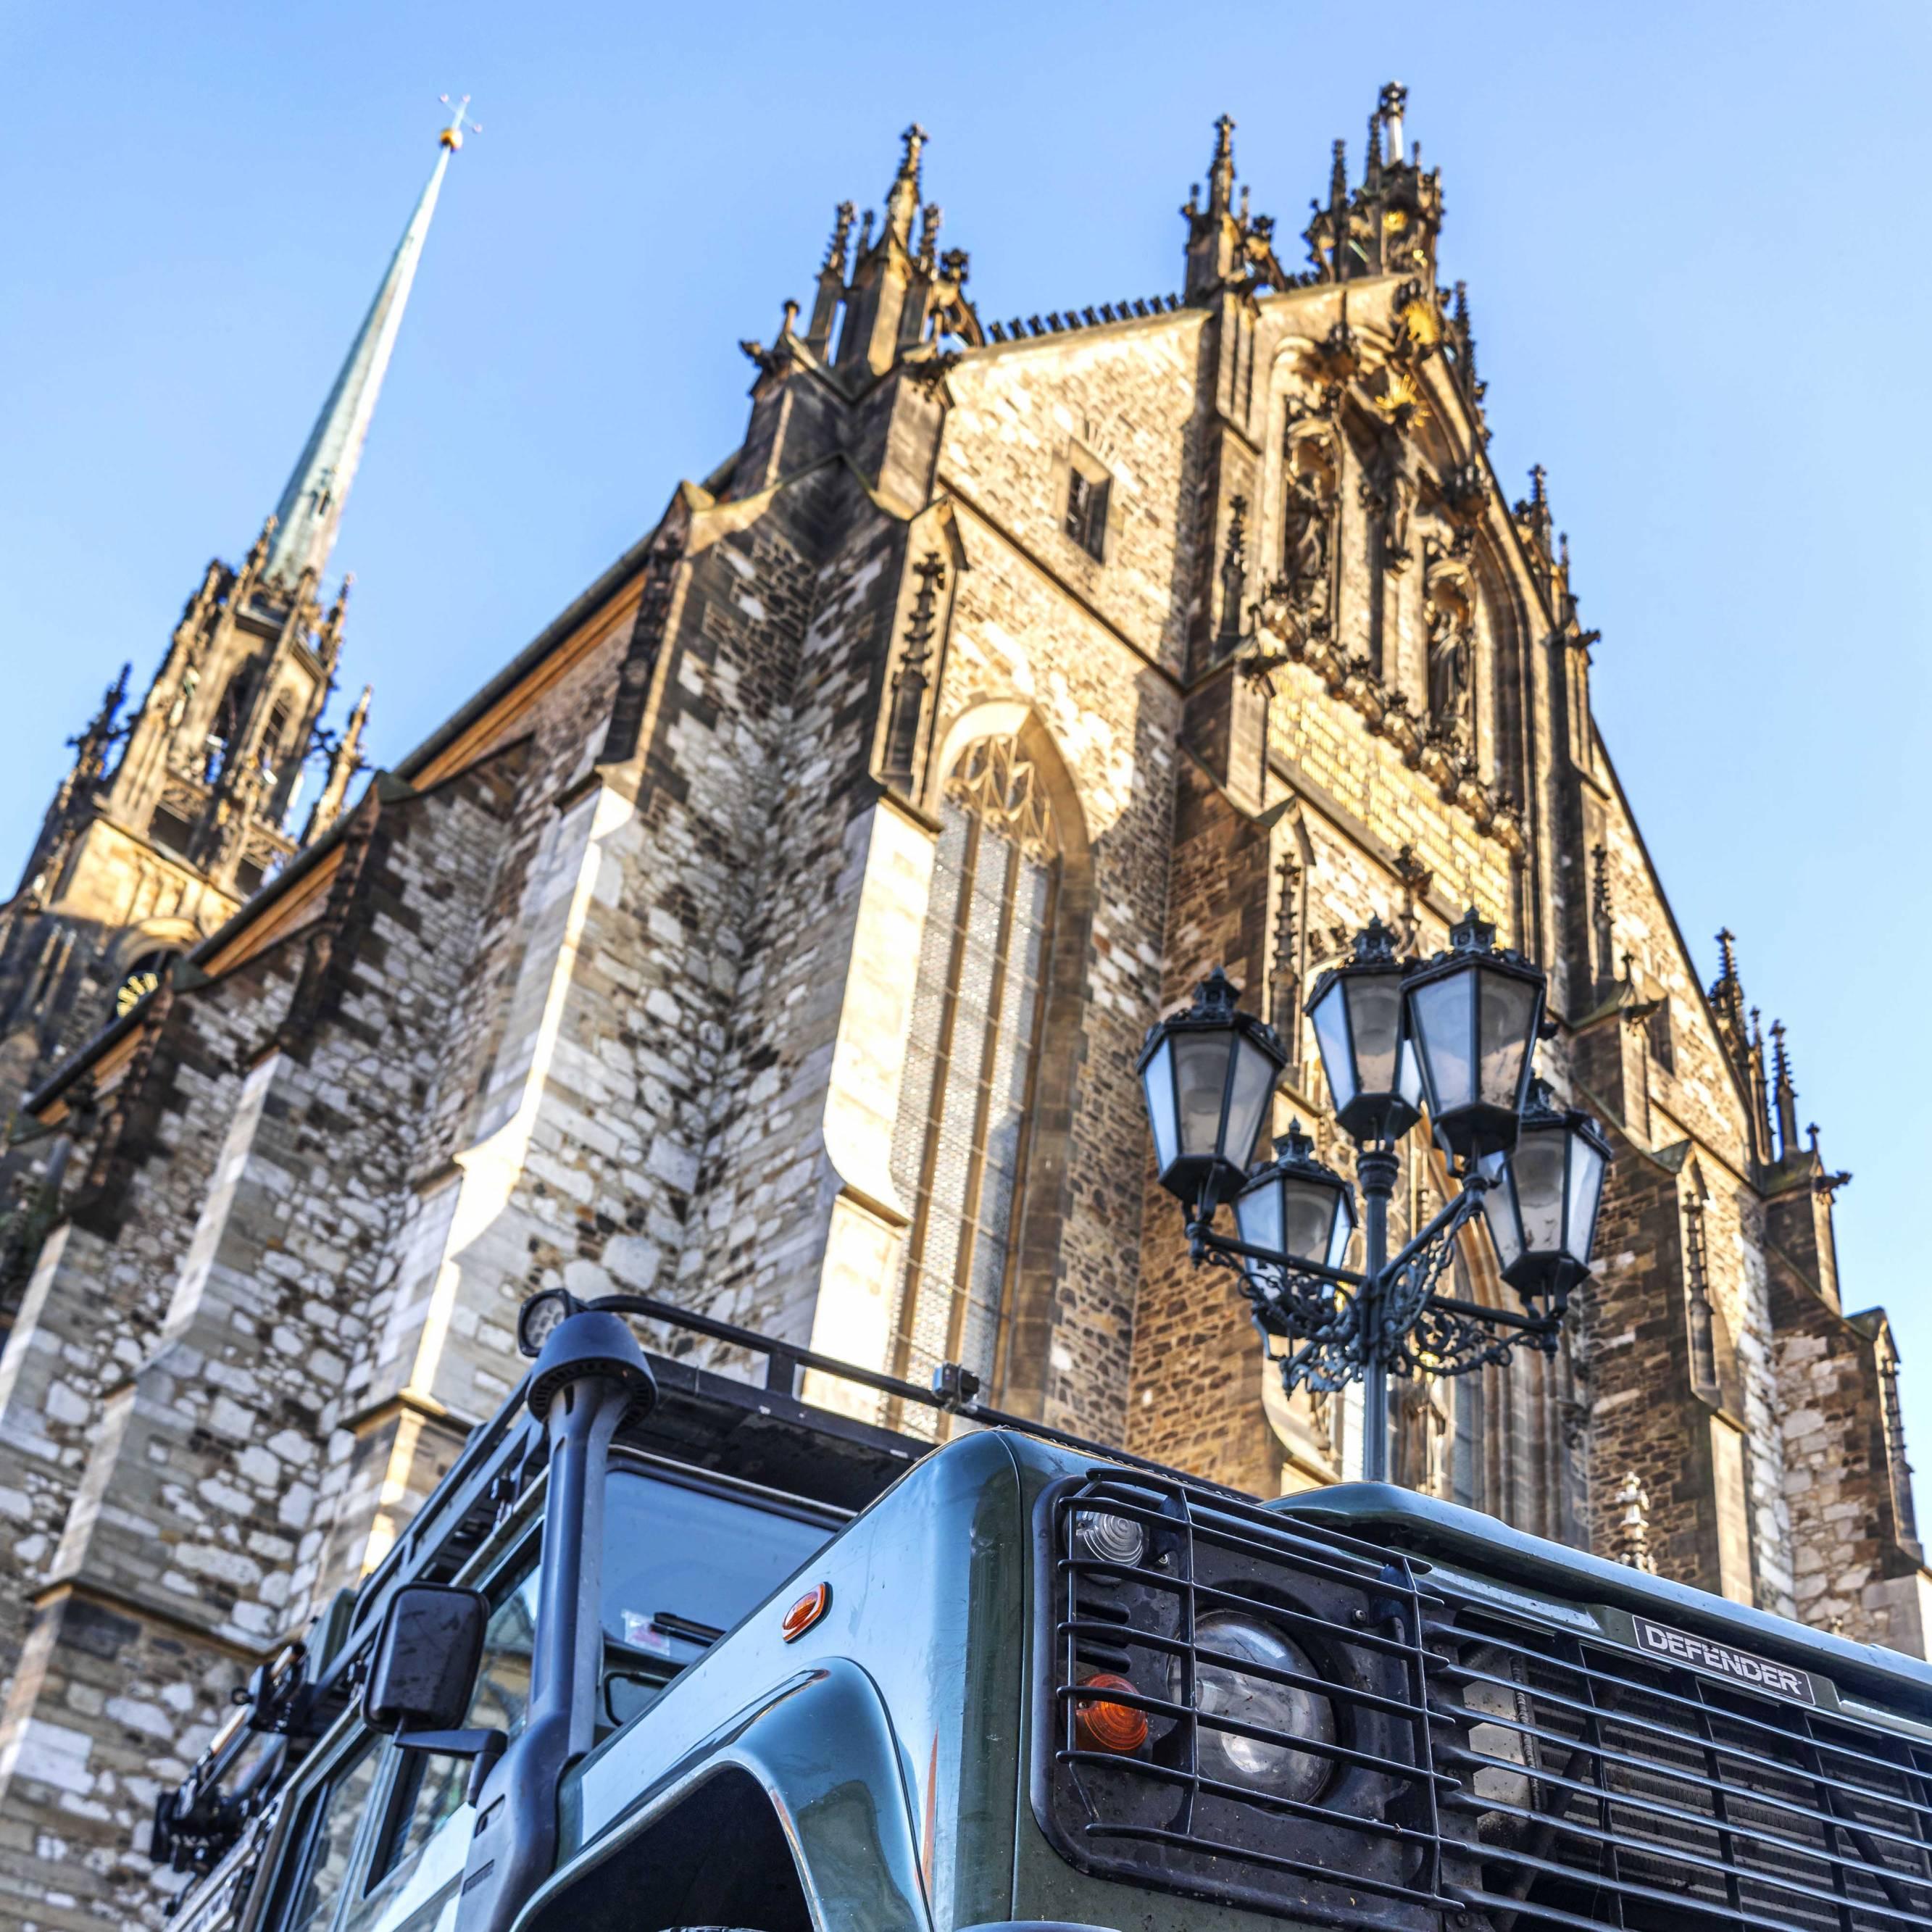 St. Peter und Paul Cathedral in Brno, Czech Republic